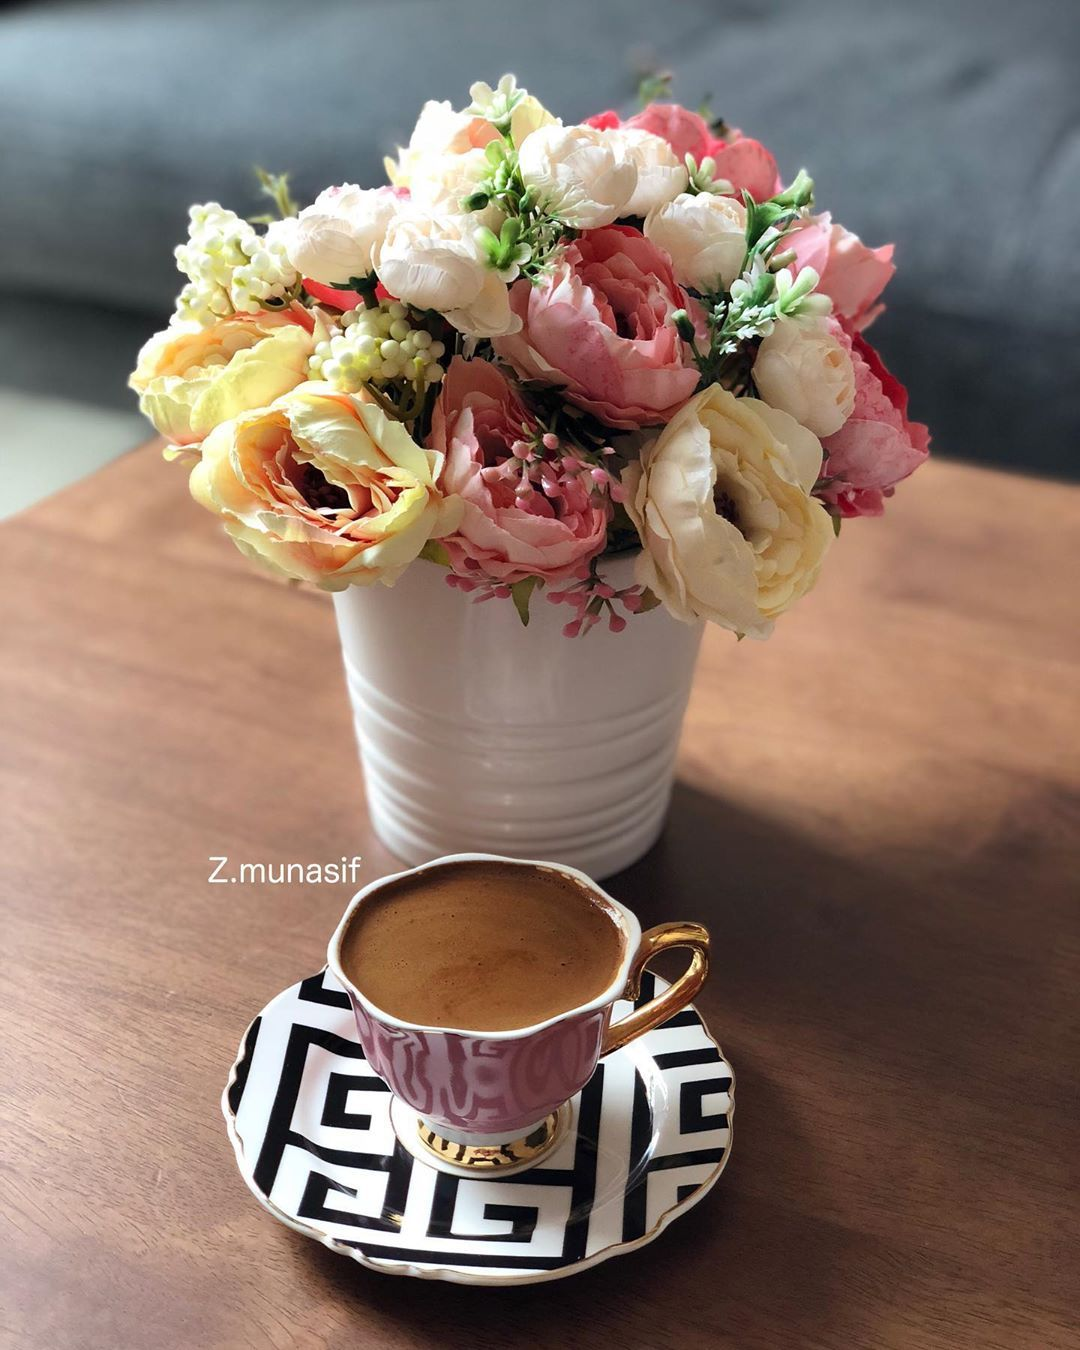 Umalwaleed Pe Instagram الجم ال يأتي على هيئة ورد و كوب قه وه تقديماتكم صباحيات صباح الخير ورد صناعي و Turkish Coffee Cofee Cup Food